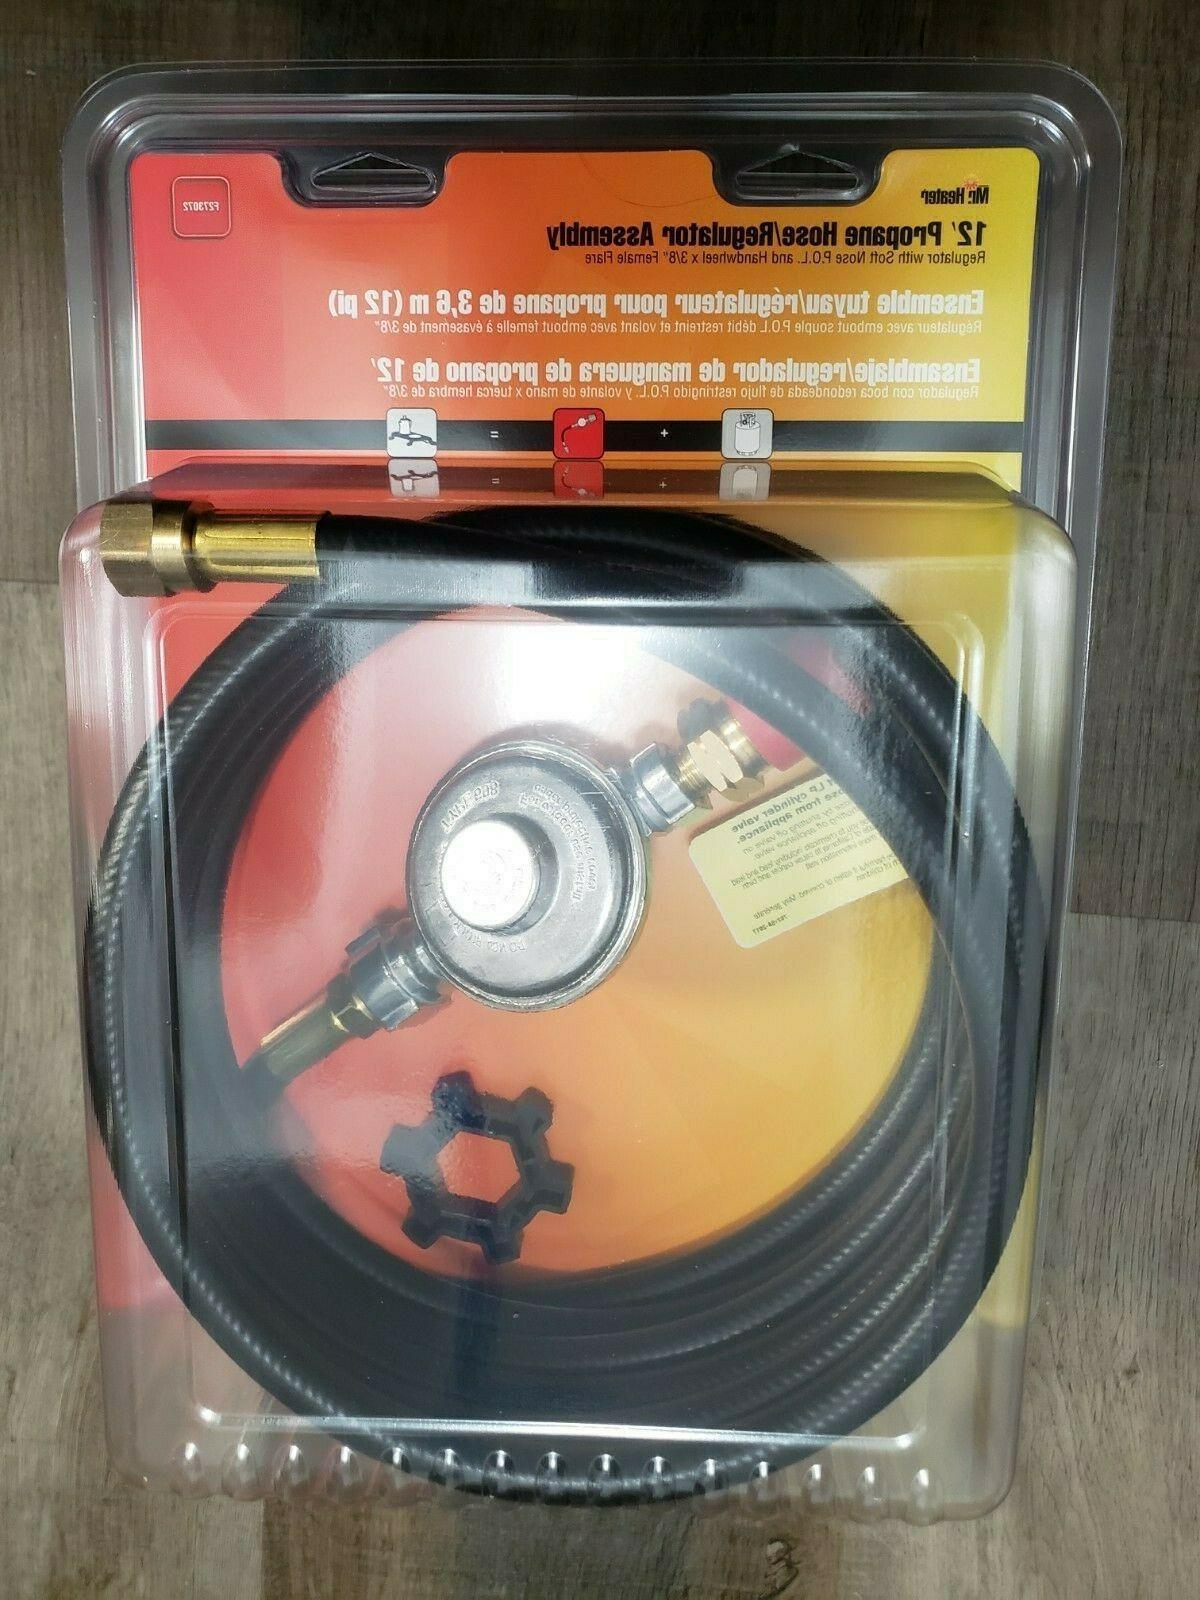 Enerco - Mr Heater 12 Propane Hose Assembly F273702